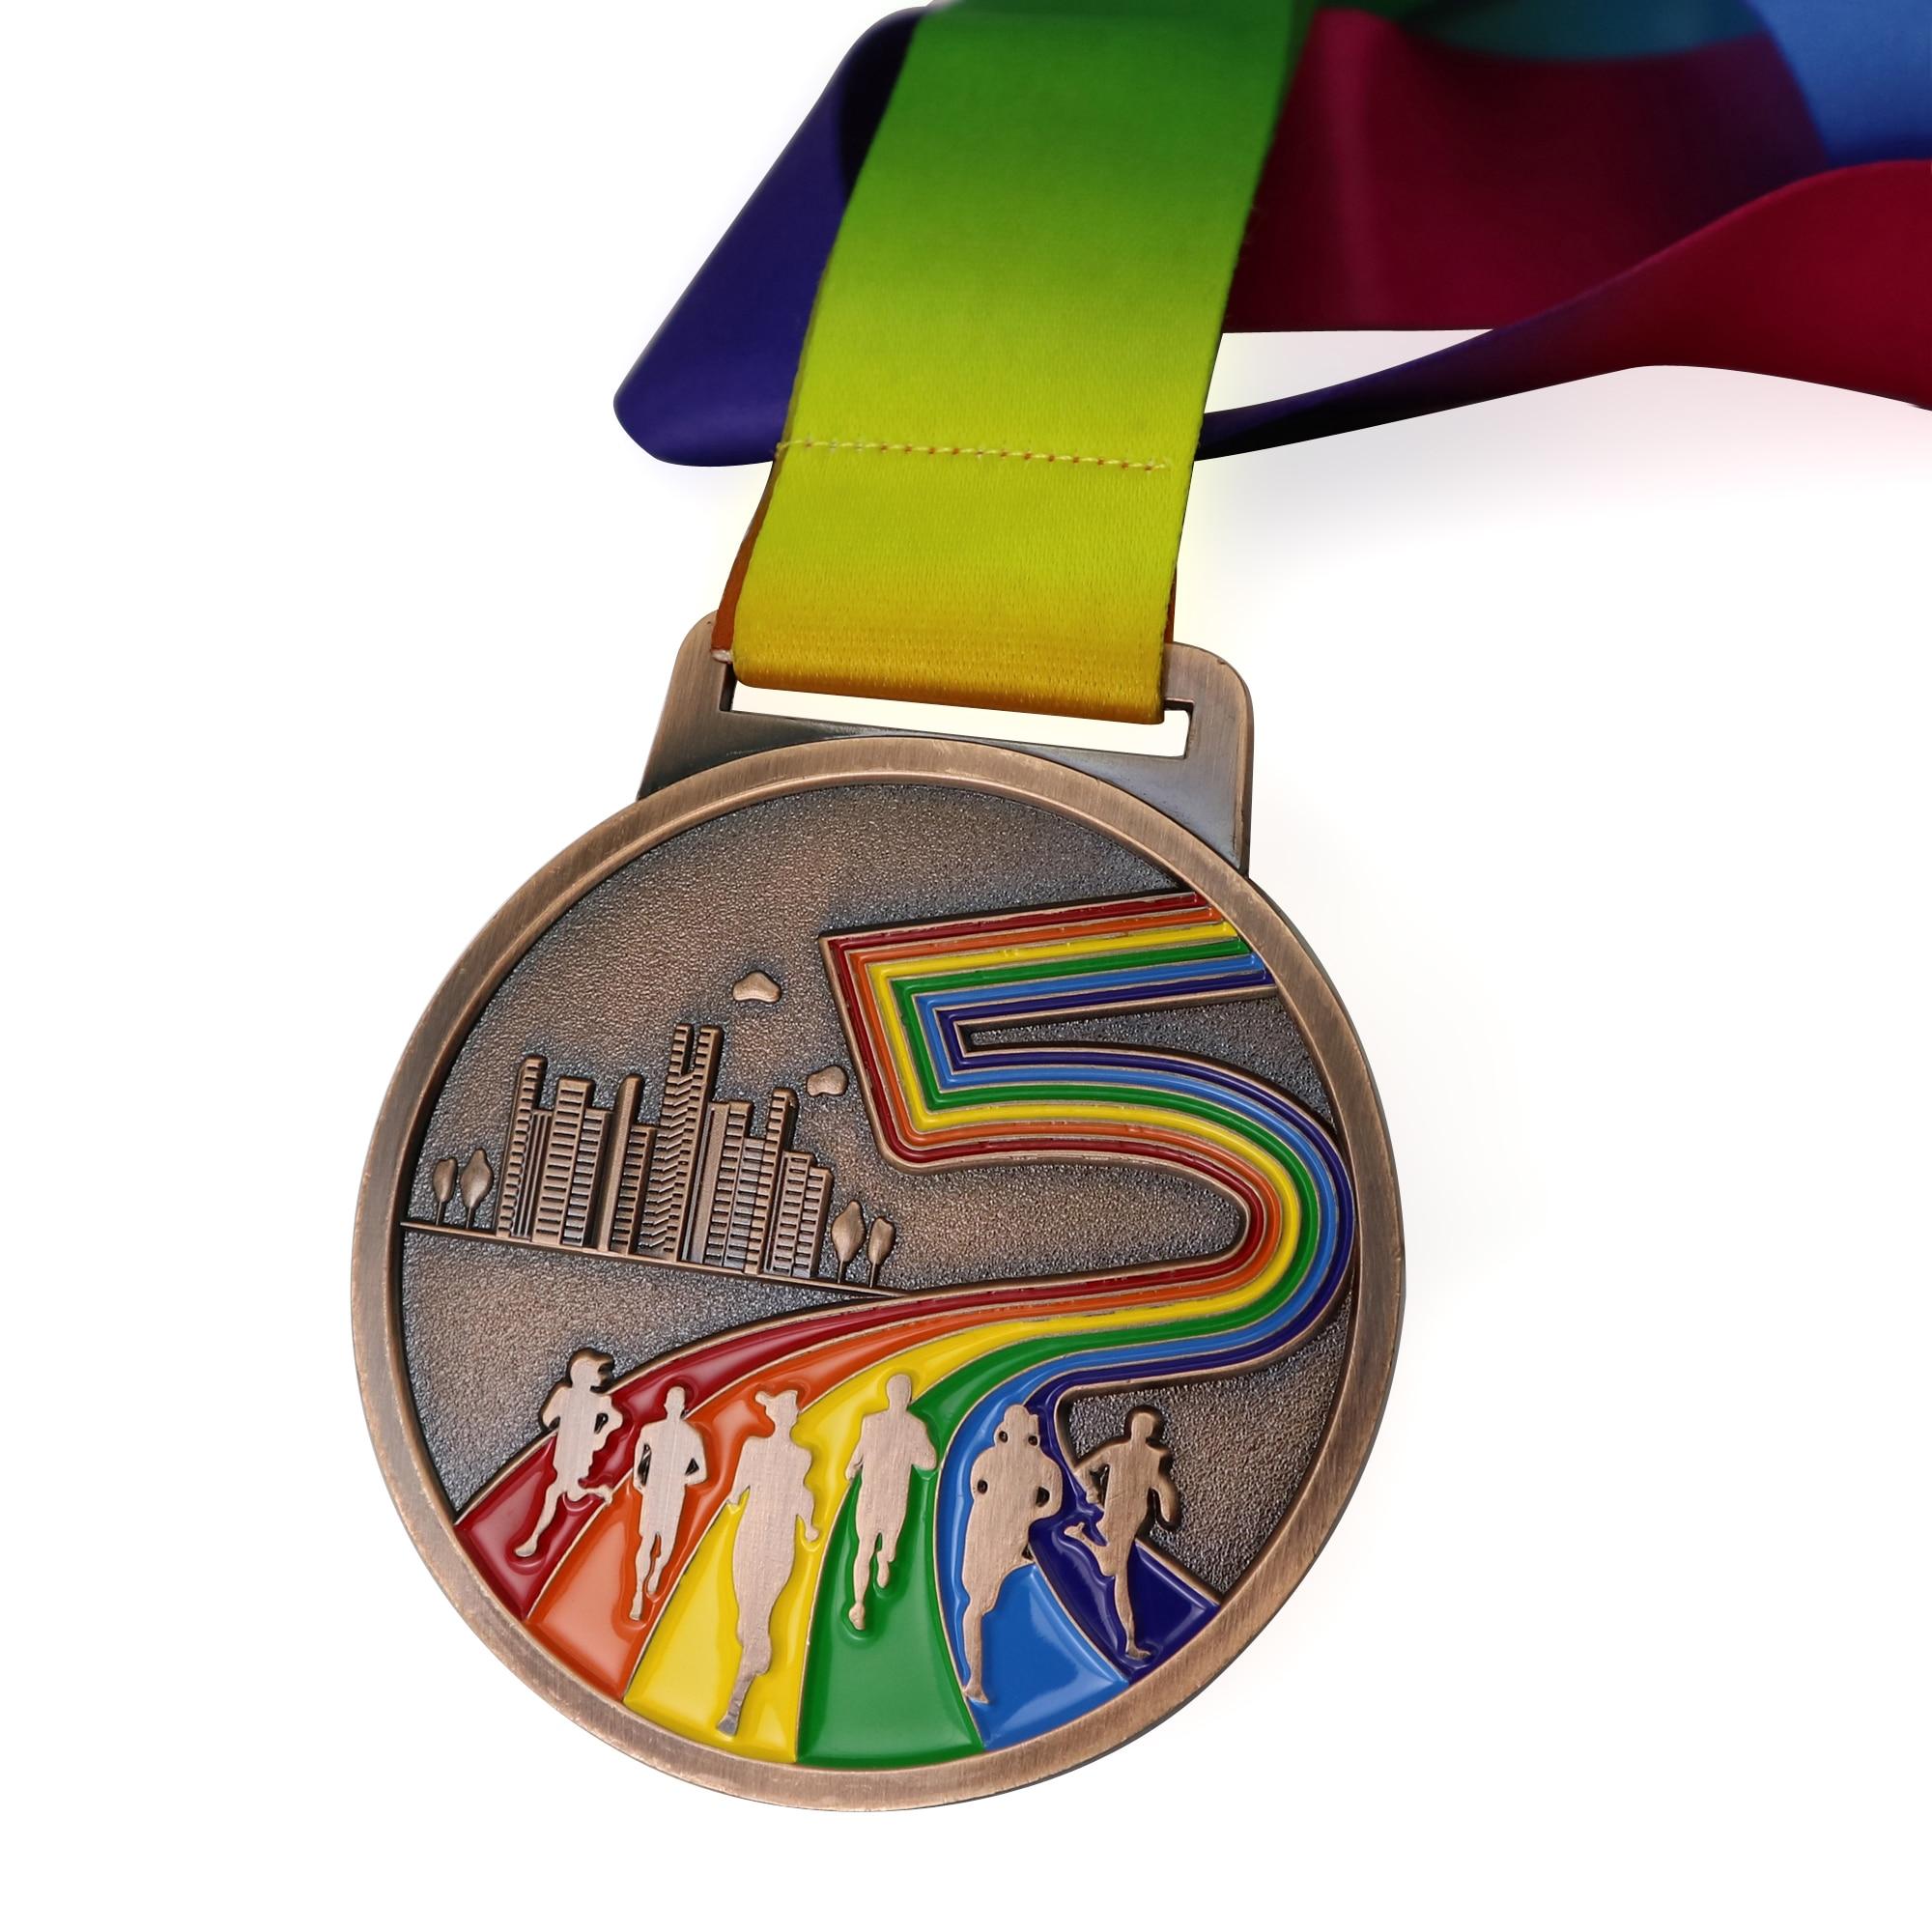 2 Gold 26.2 Marathon Race Medal Award with Free Custom Engraving Prime Marathon Medals